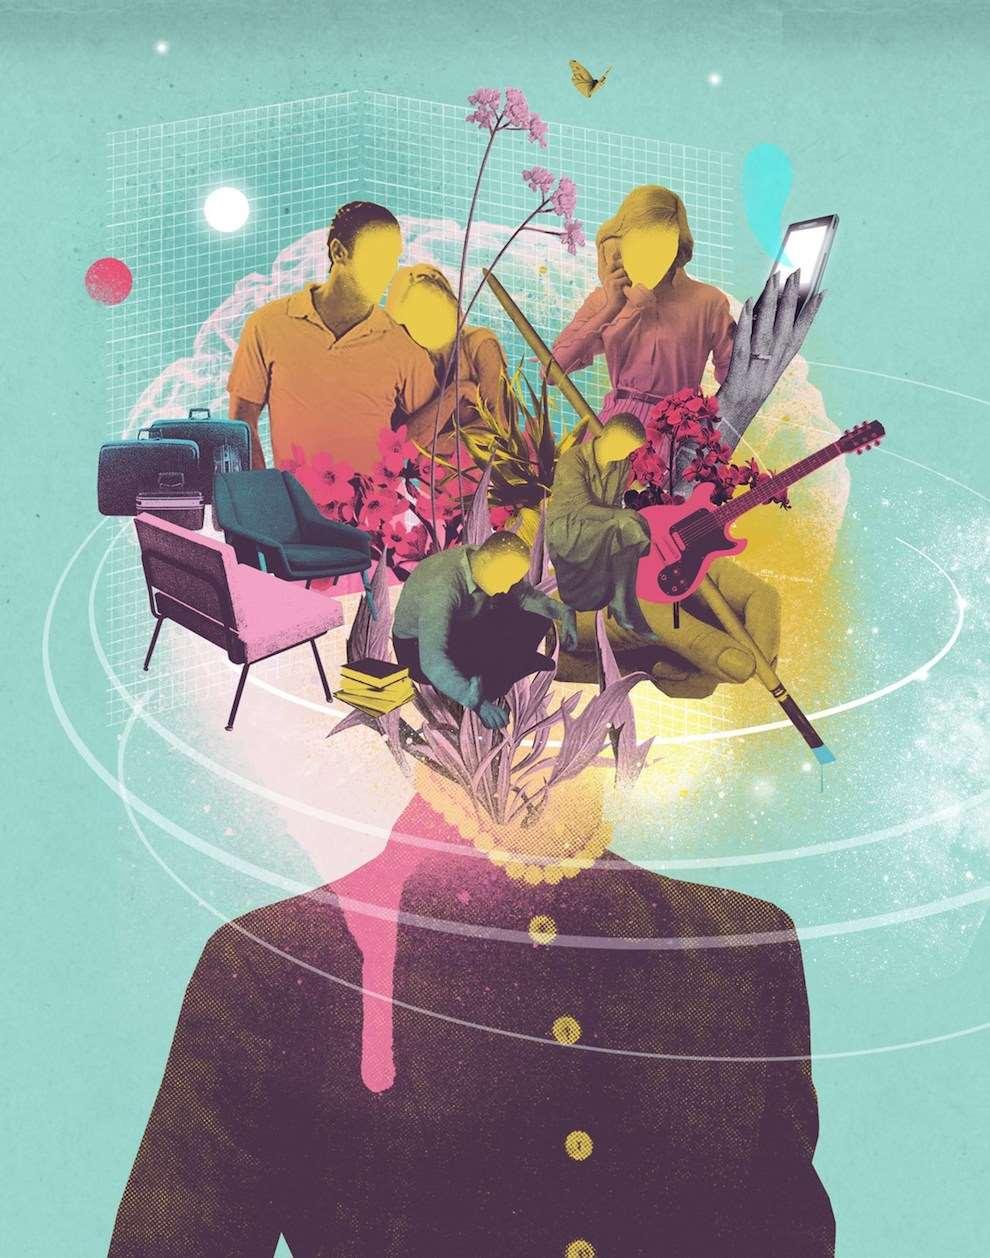 Mario Wagner, Mixed media conceptual illustration using photo montage